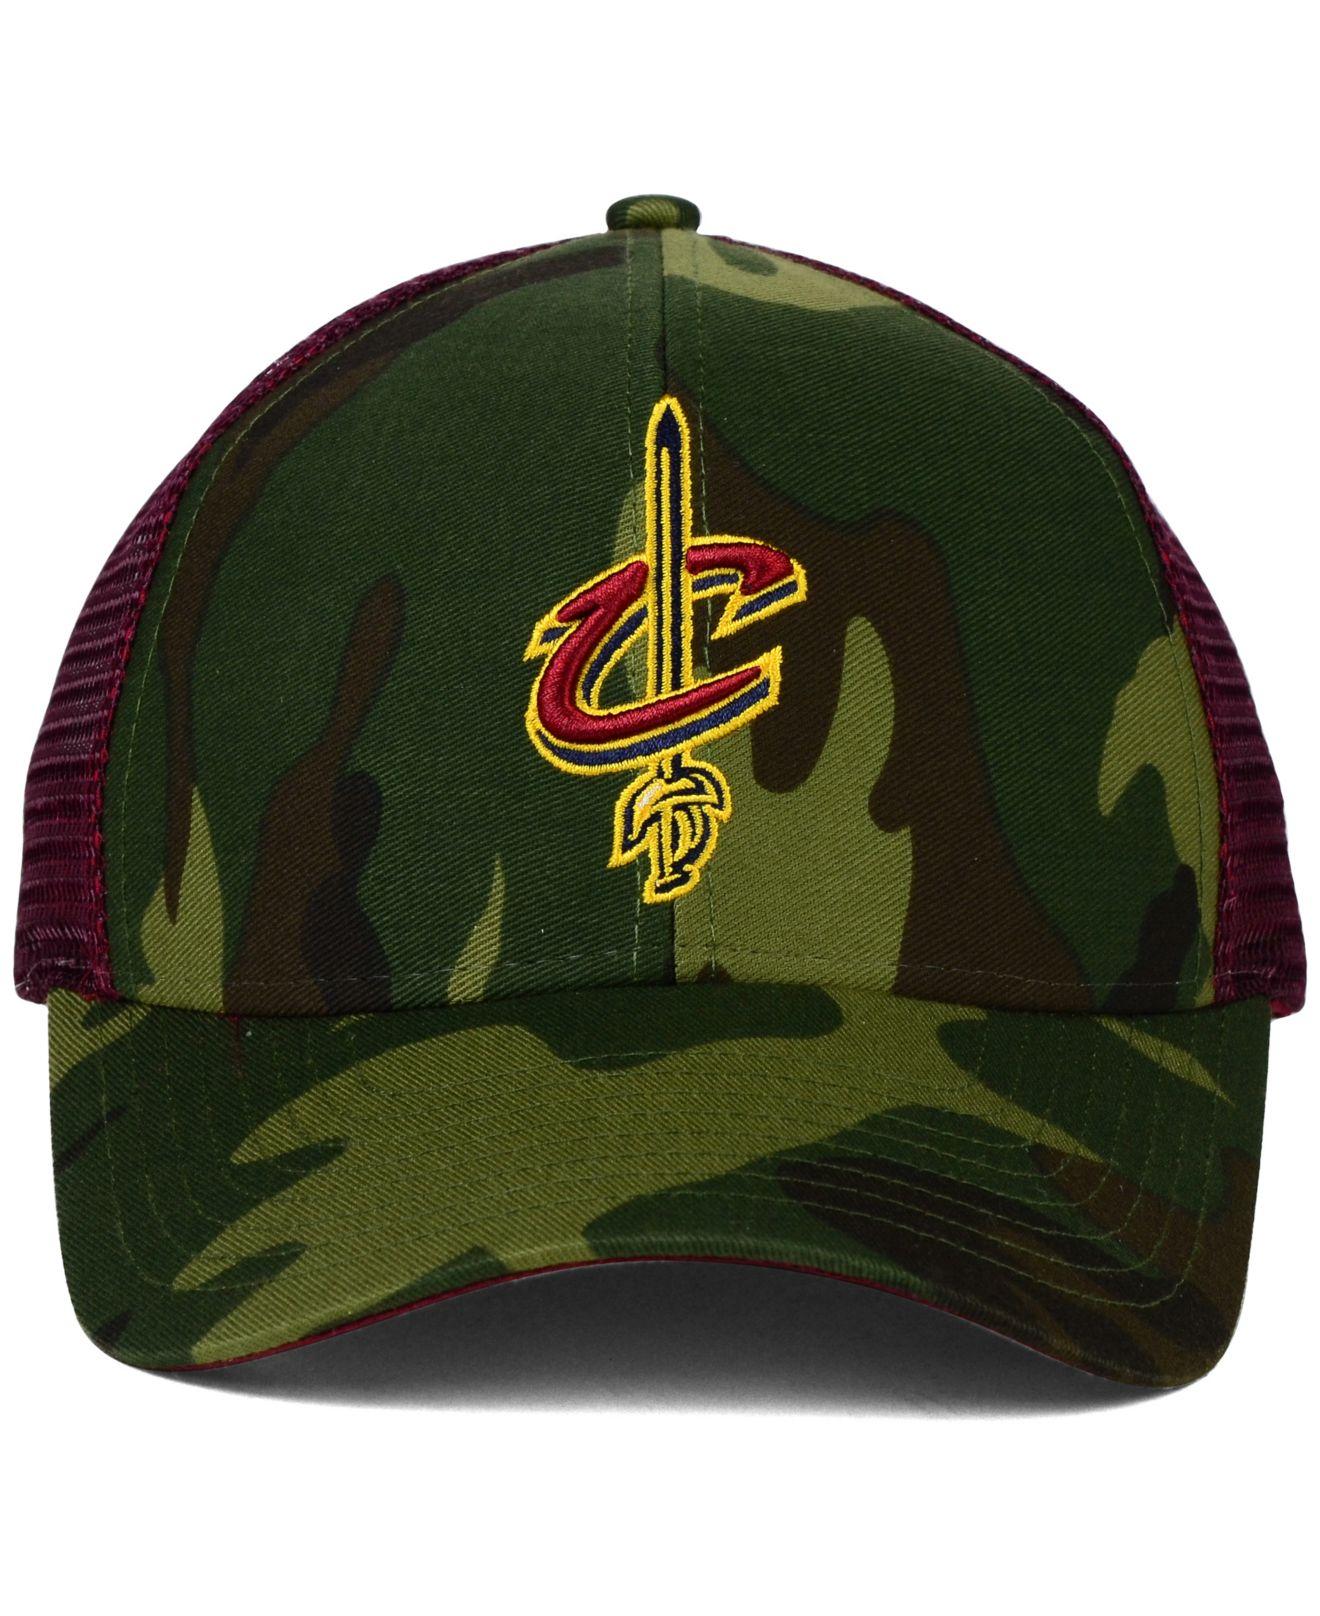 f18c777eb645a ... new era original fit 9fifty adjustable hat camo 1b152 6e42f greece lyst  adidas cleveland cavaliers camo trucker cap in green for men 6b9b9 78d4b ...